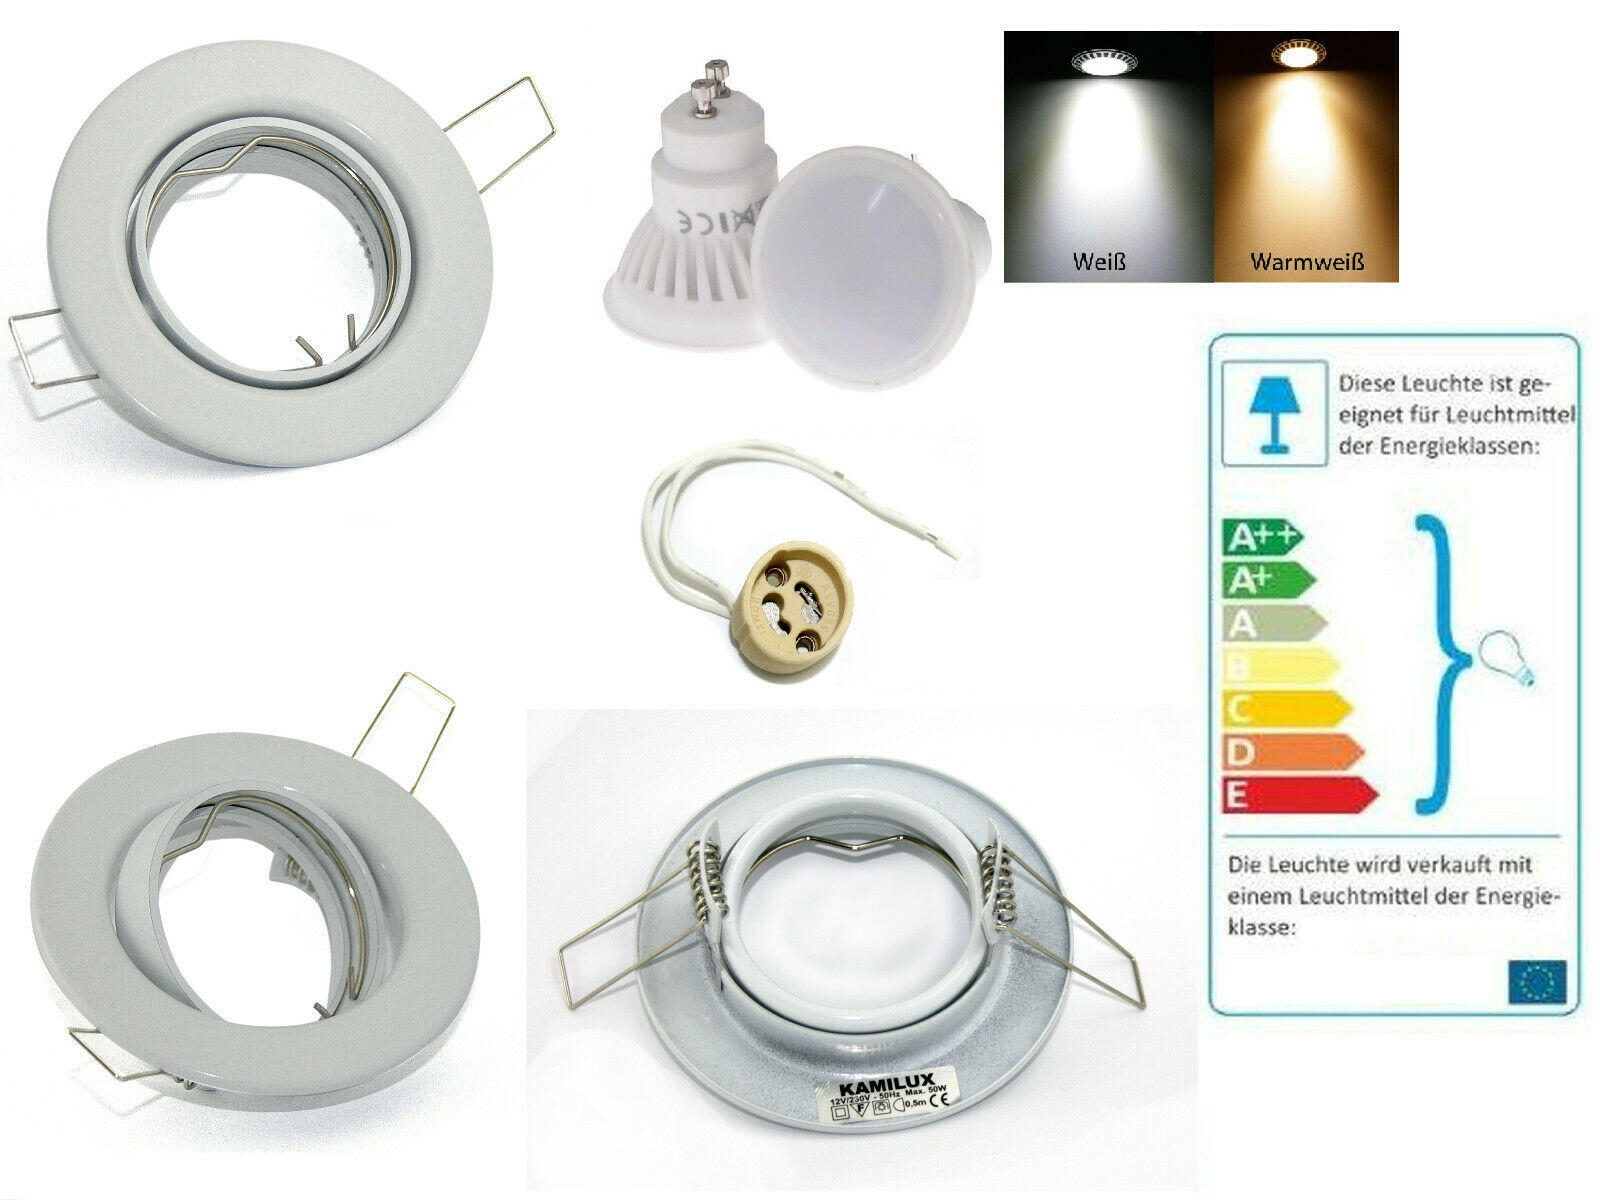 9 Watt LED Einbaustrahler Lia   720 Lumen   230Volt   Farbe Weiss